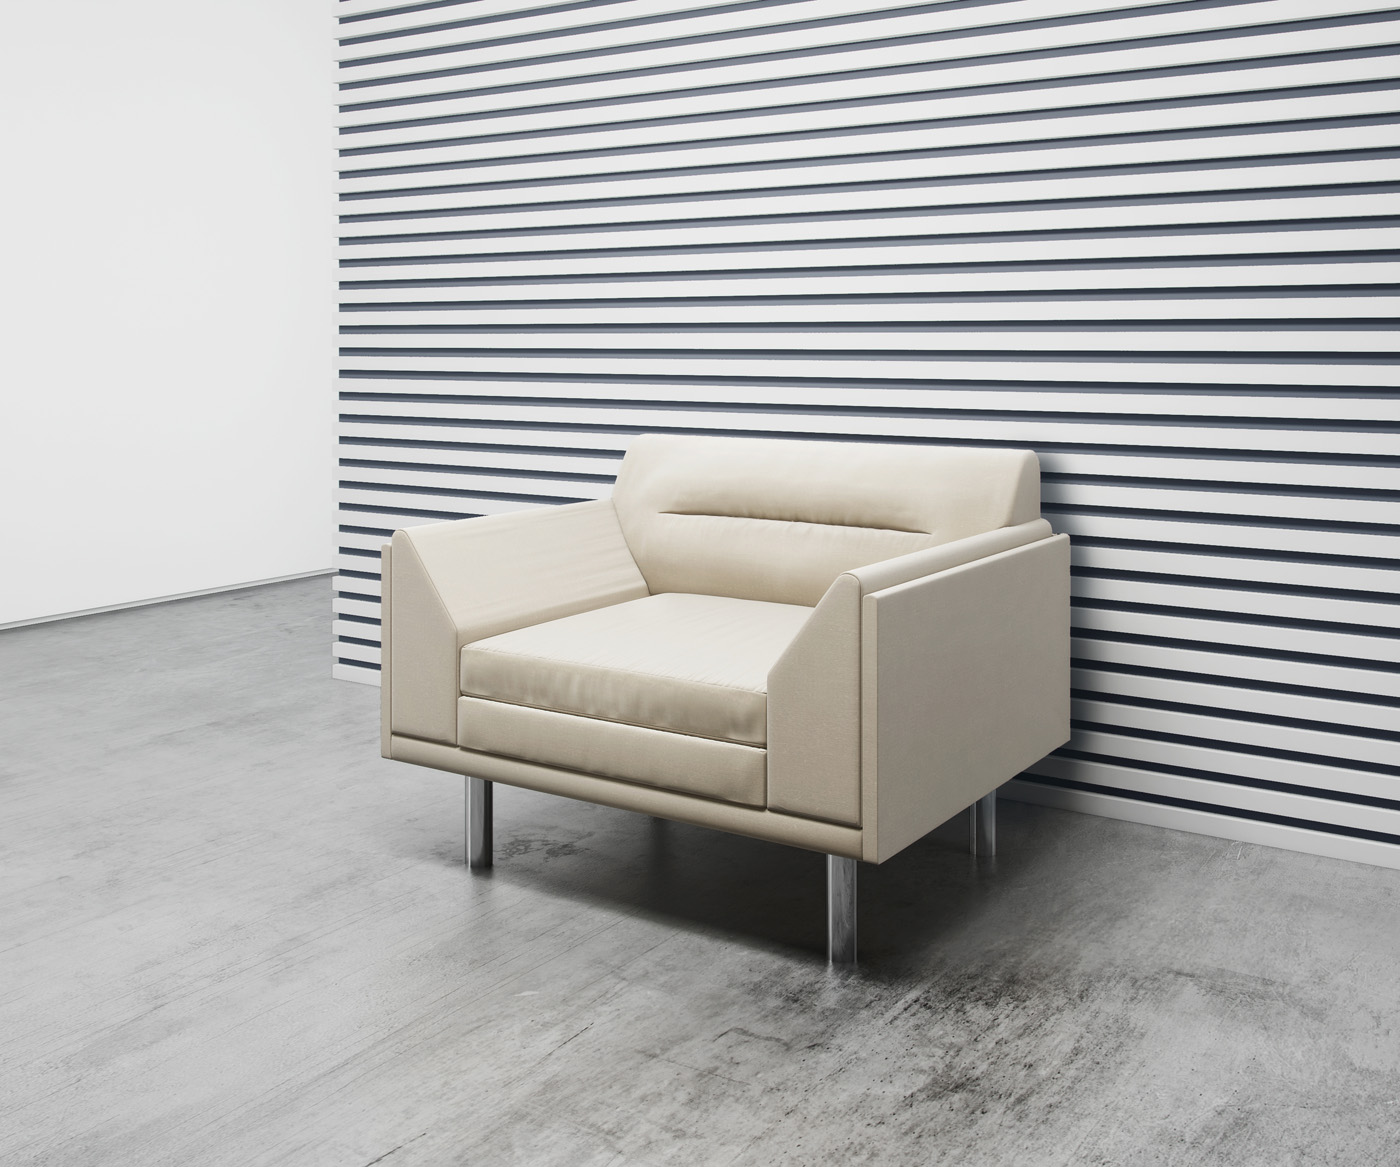 Milano, chair